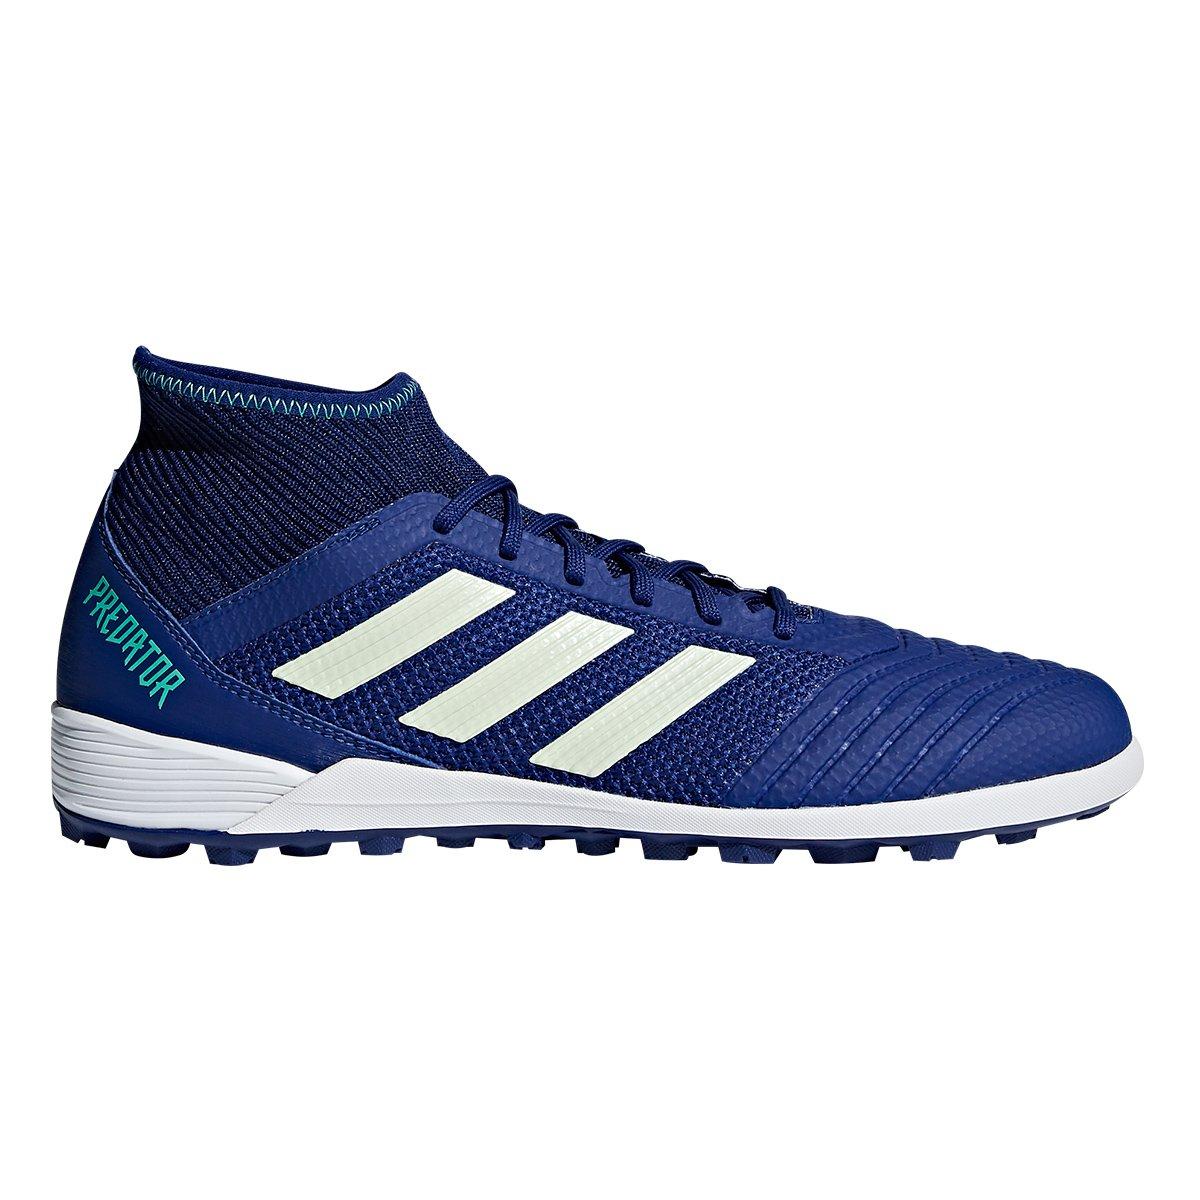 new product dd4d8 c63c7 Chuteira Society Adidas Predator 18 3 TF - Compre Agora   Allianz Parque  Shop